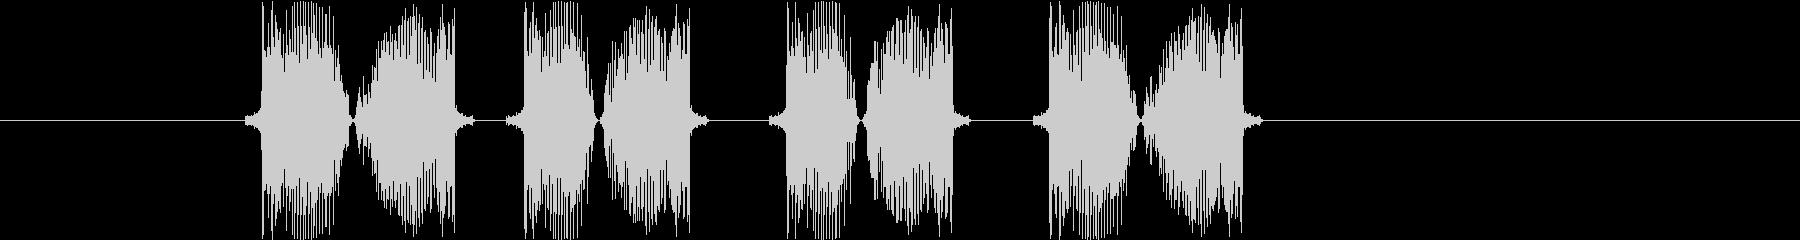 DJスクラッチ5high(チュキチュキ)の未再生の波形